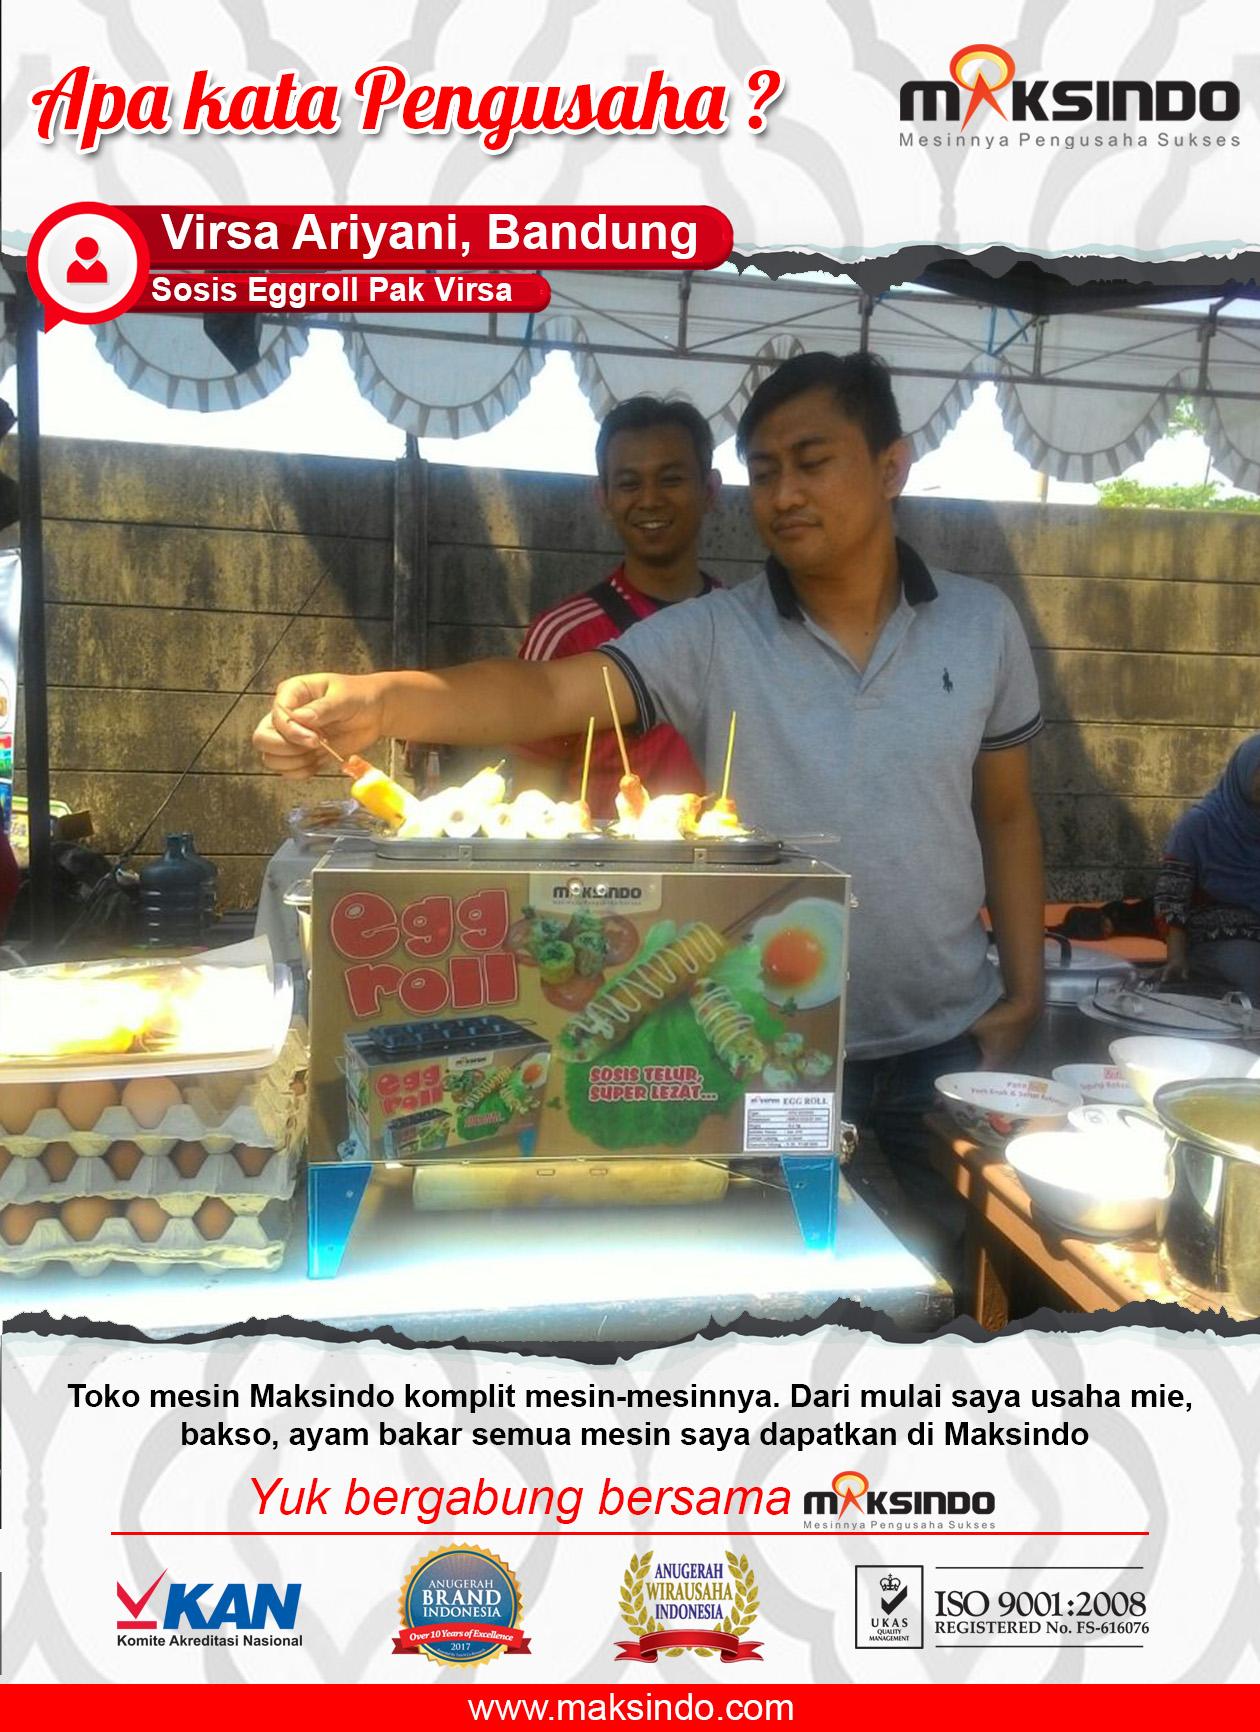 Sosis Eggroll Pak Virsa : Maksindo Menyediakan Mesin Komplit Untuk Usaha